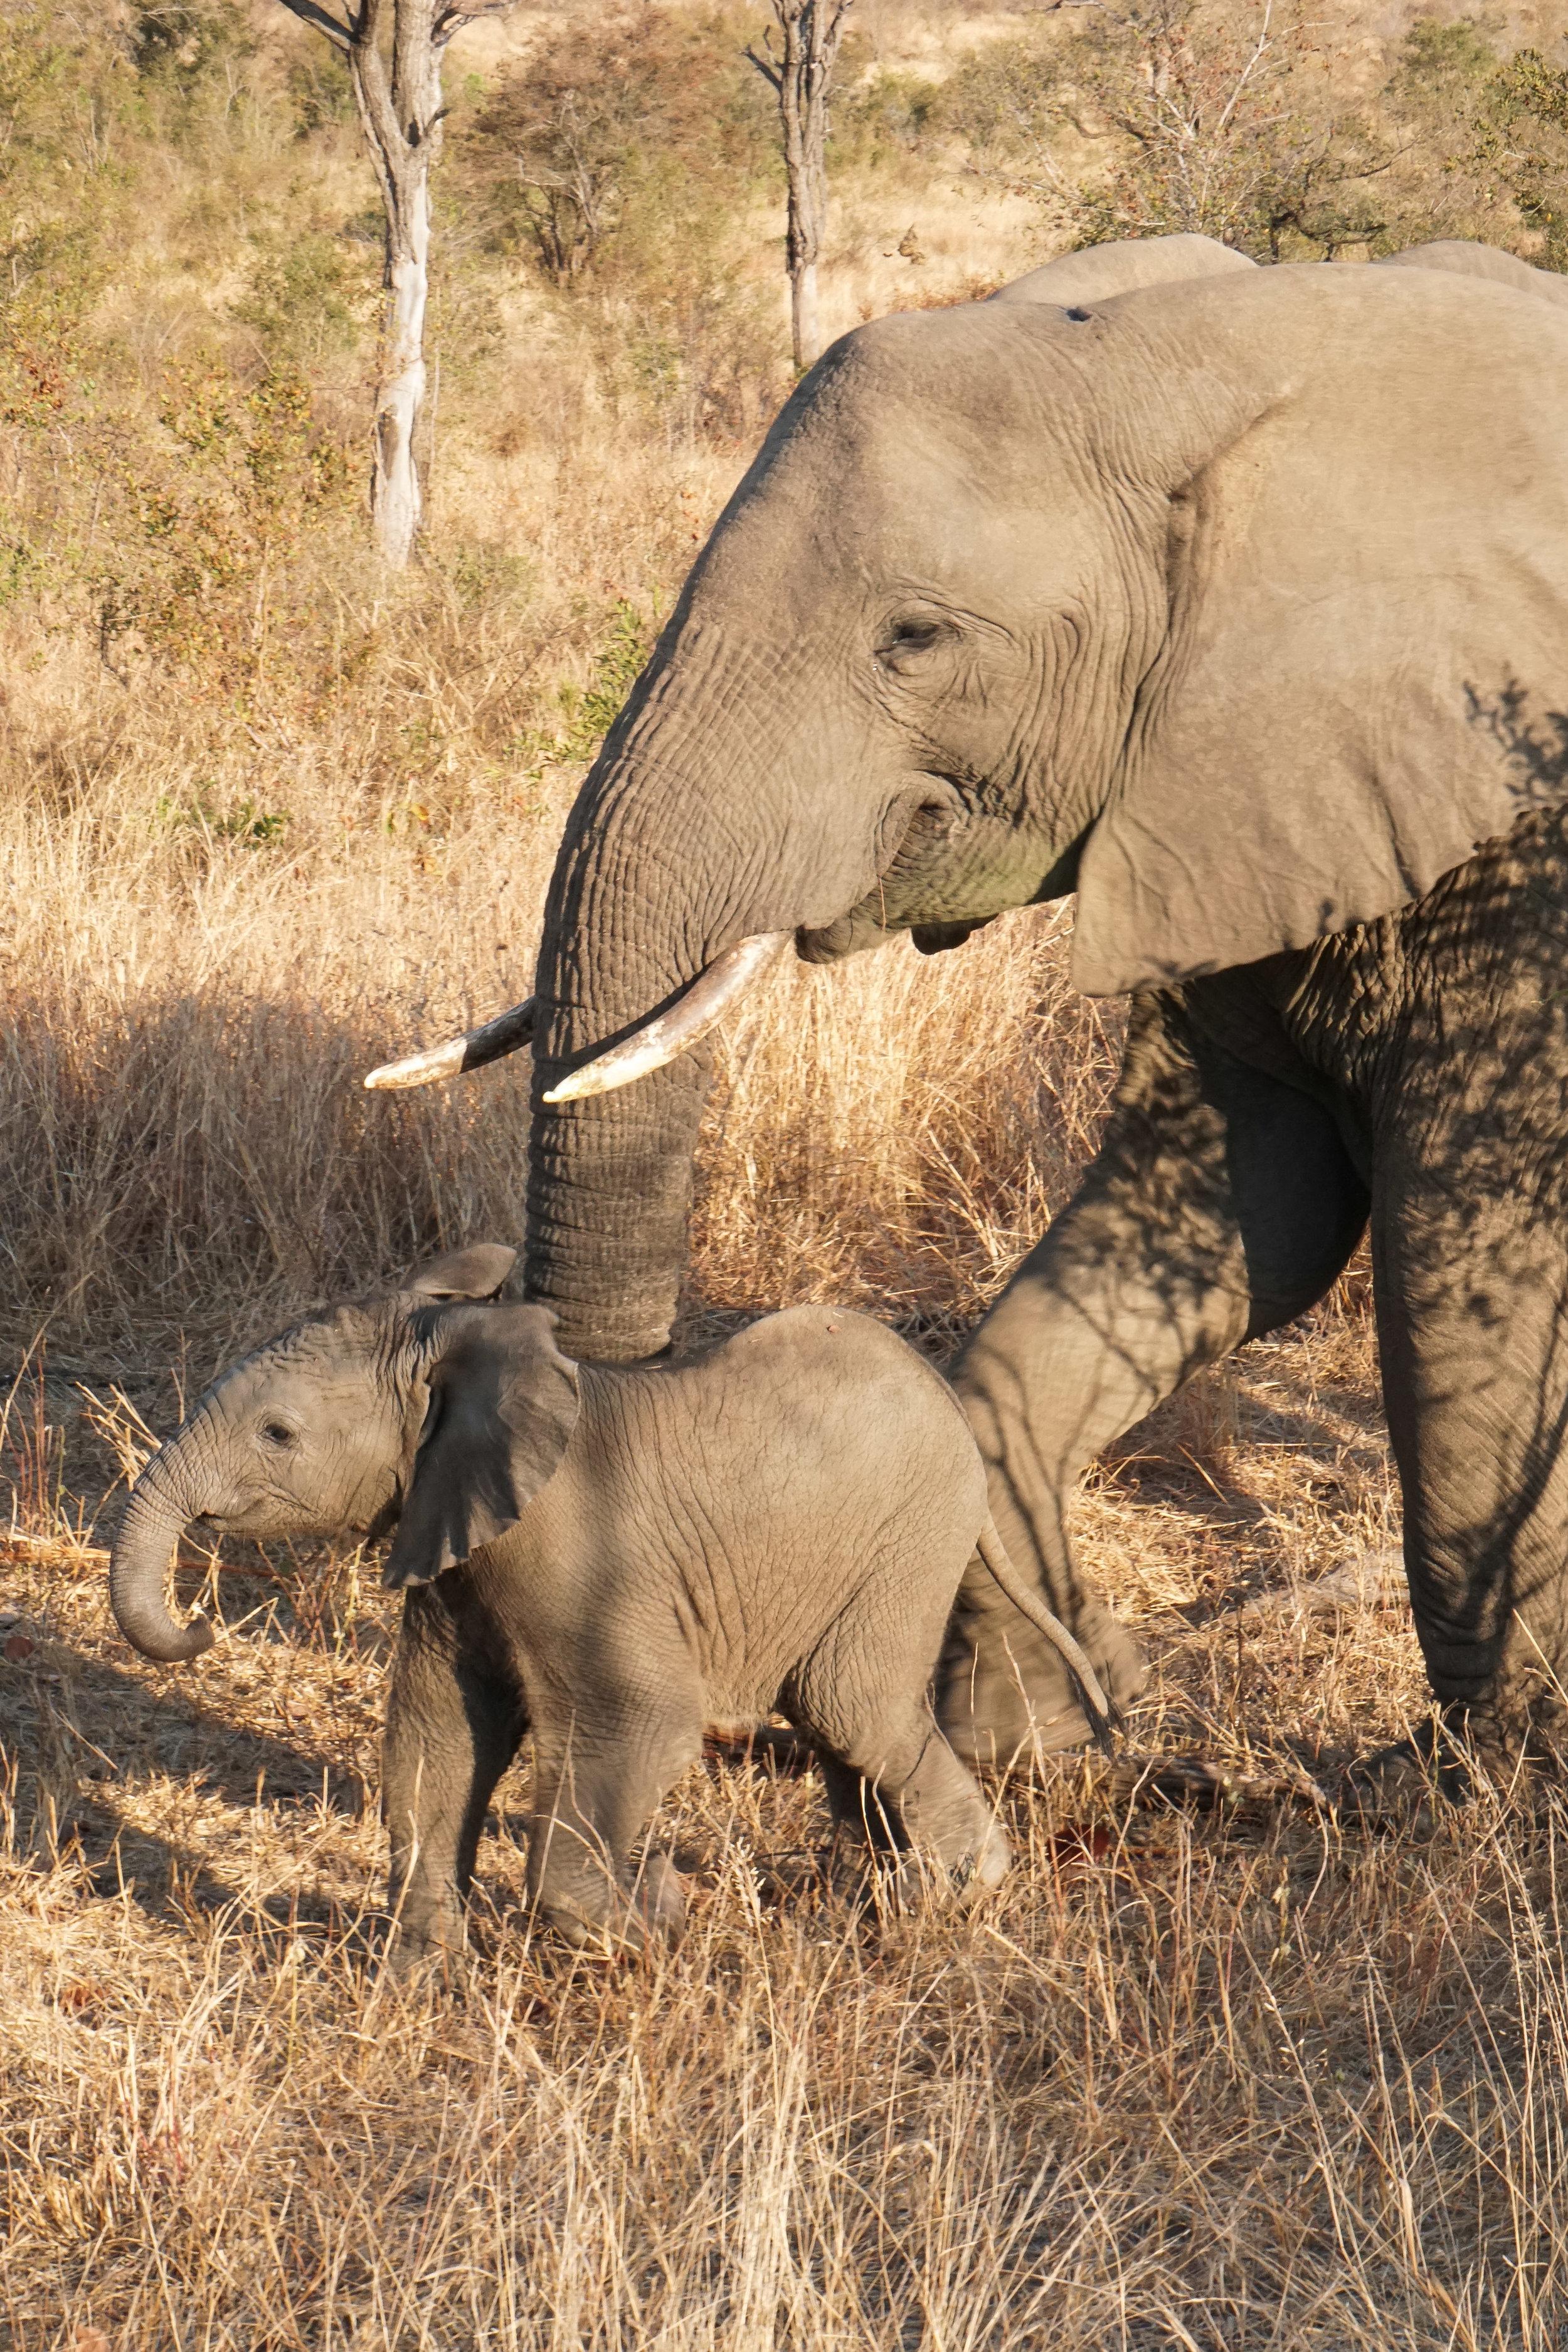 curio.trips.south.africa.safari.mama.baby.elephant.sunset.portrait.jpg